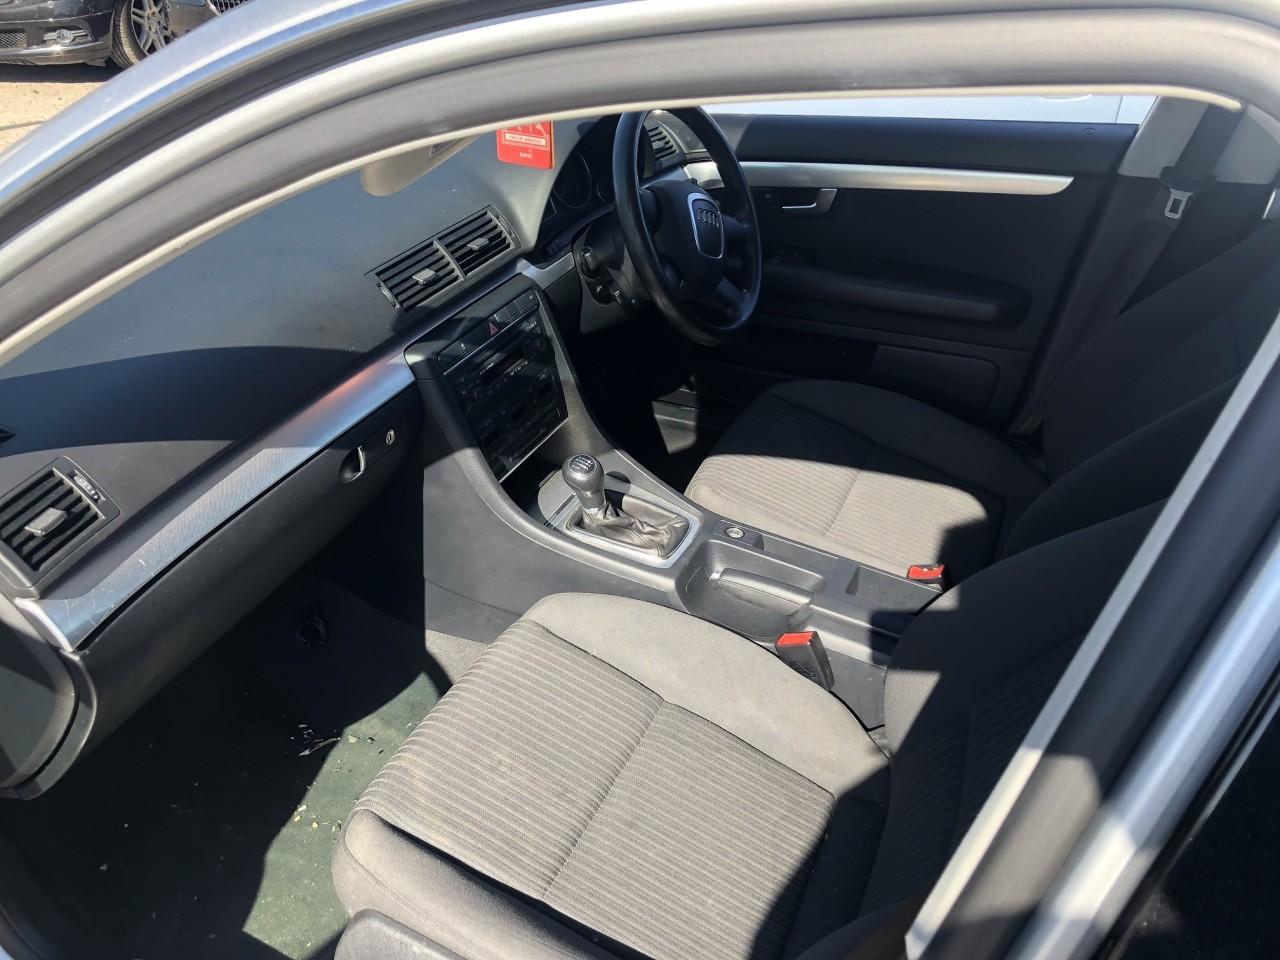 Dezmembrez Audi A4 B7 2,0 tdi 2006 BRE